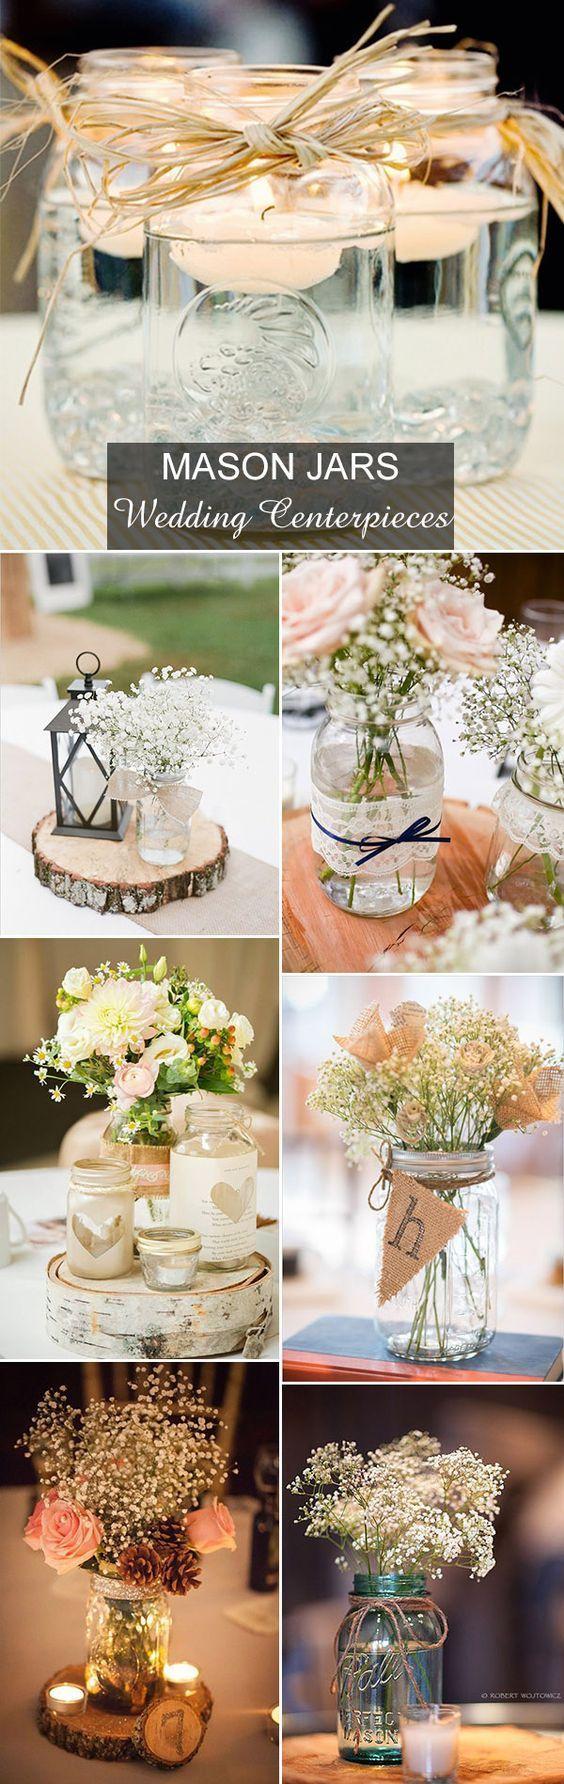 Wedding decorations reception october 2018 Rustic Wedding Ideas  Ways to Use Mason Jars  Hospitality